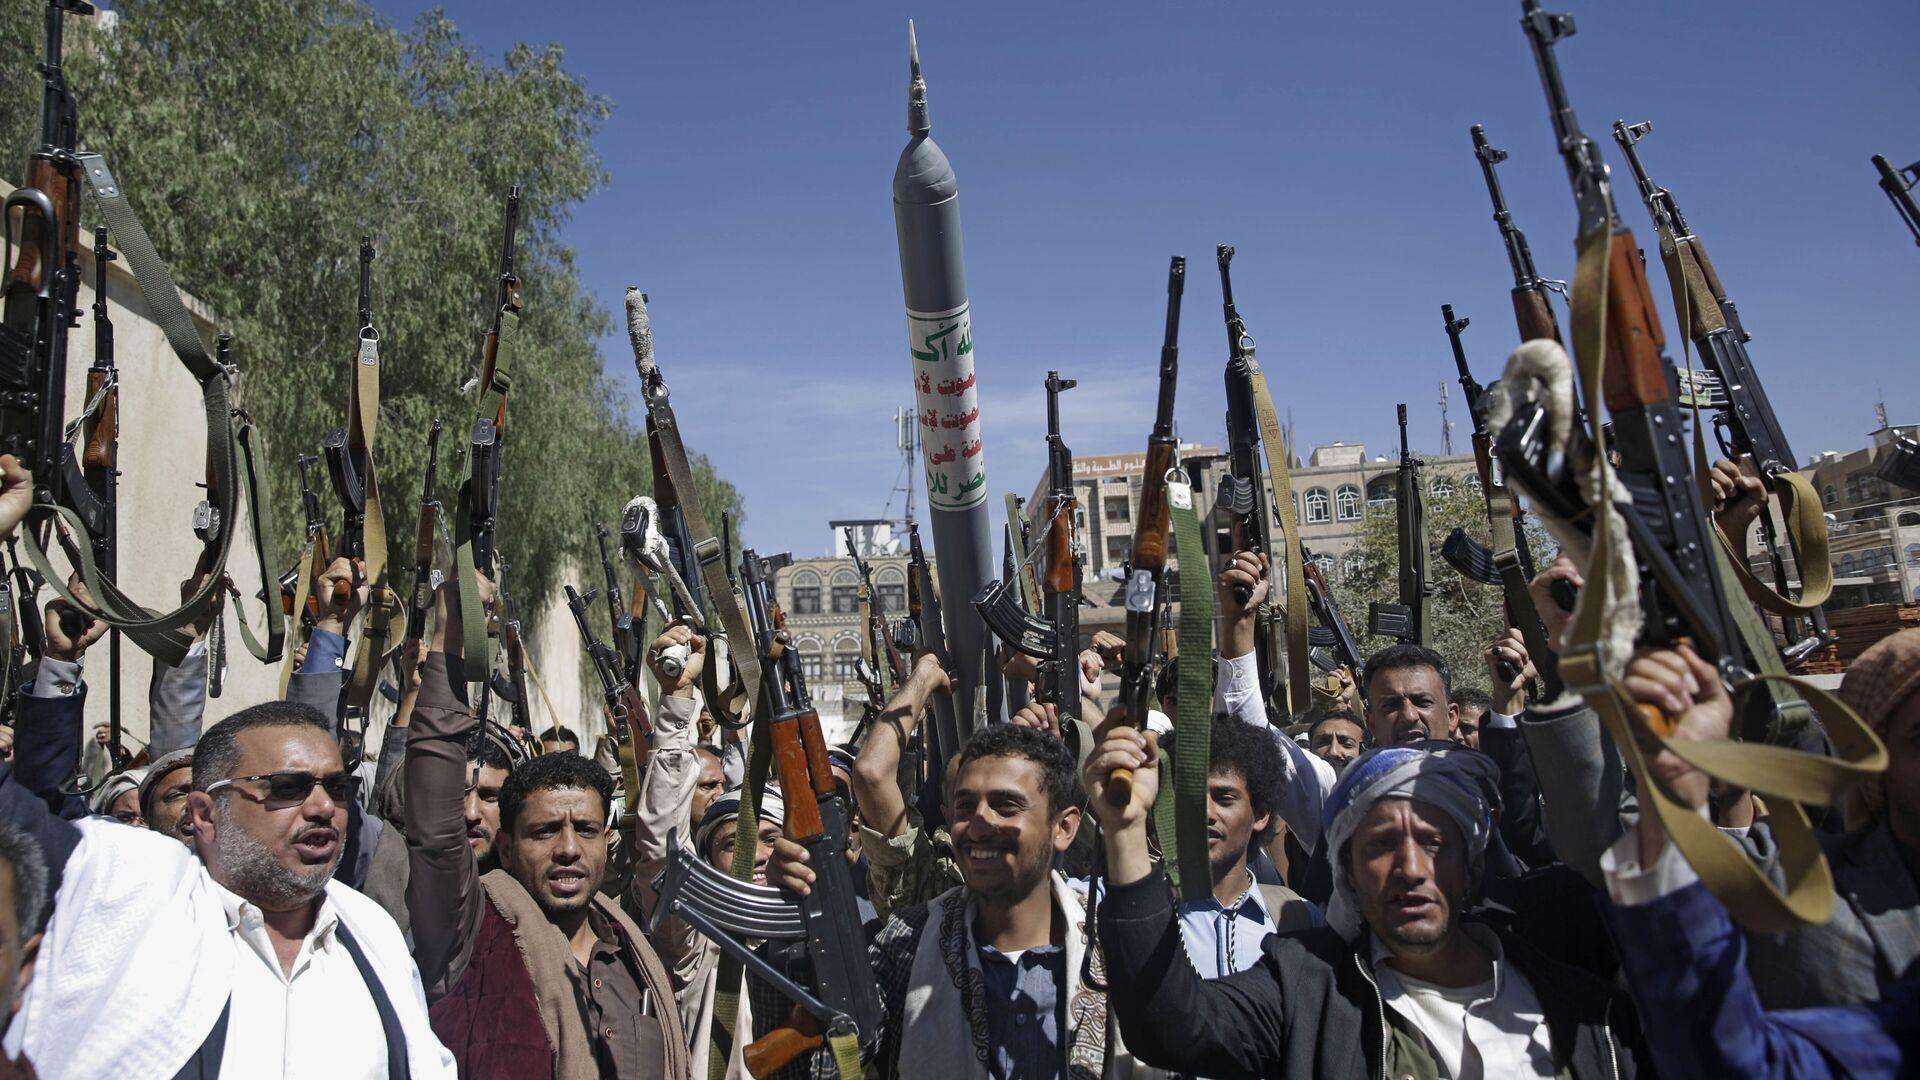 Situación en Yemen (archivo) - Sputnik Mundo, 1920, 12.03.2021